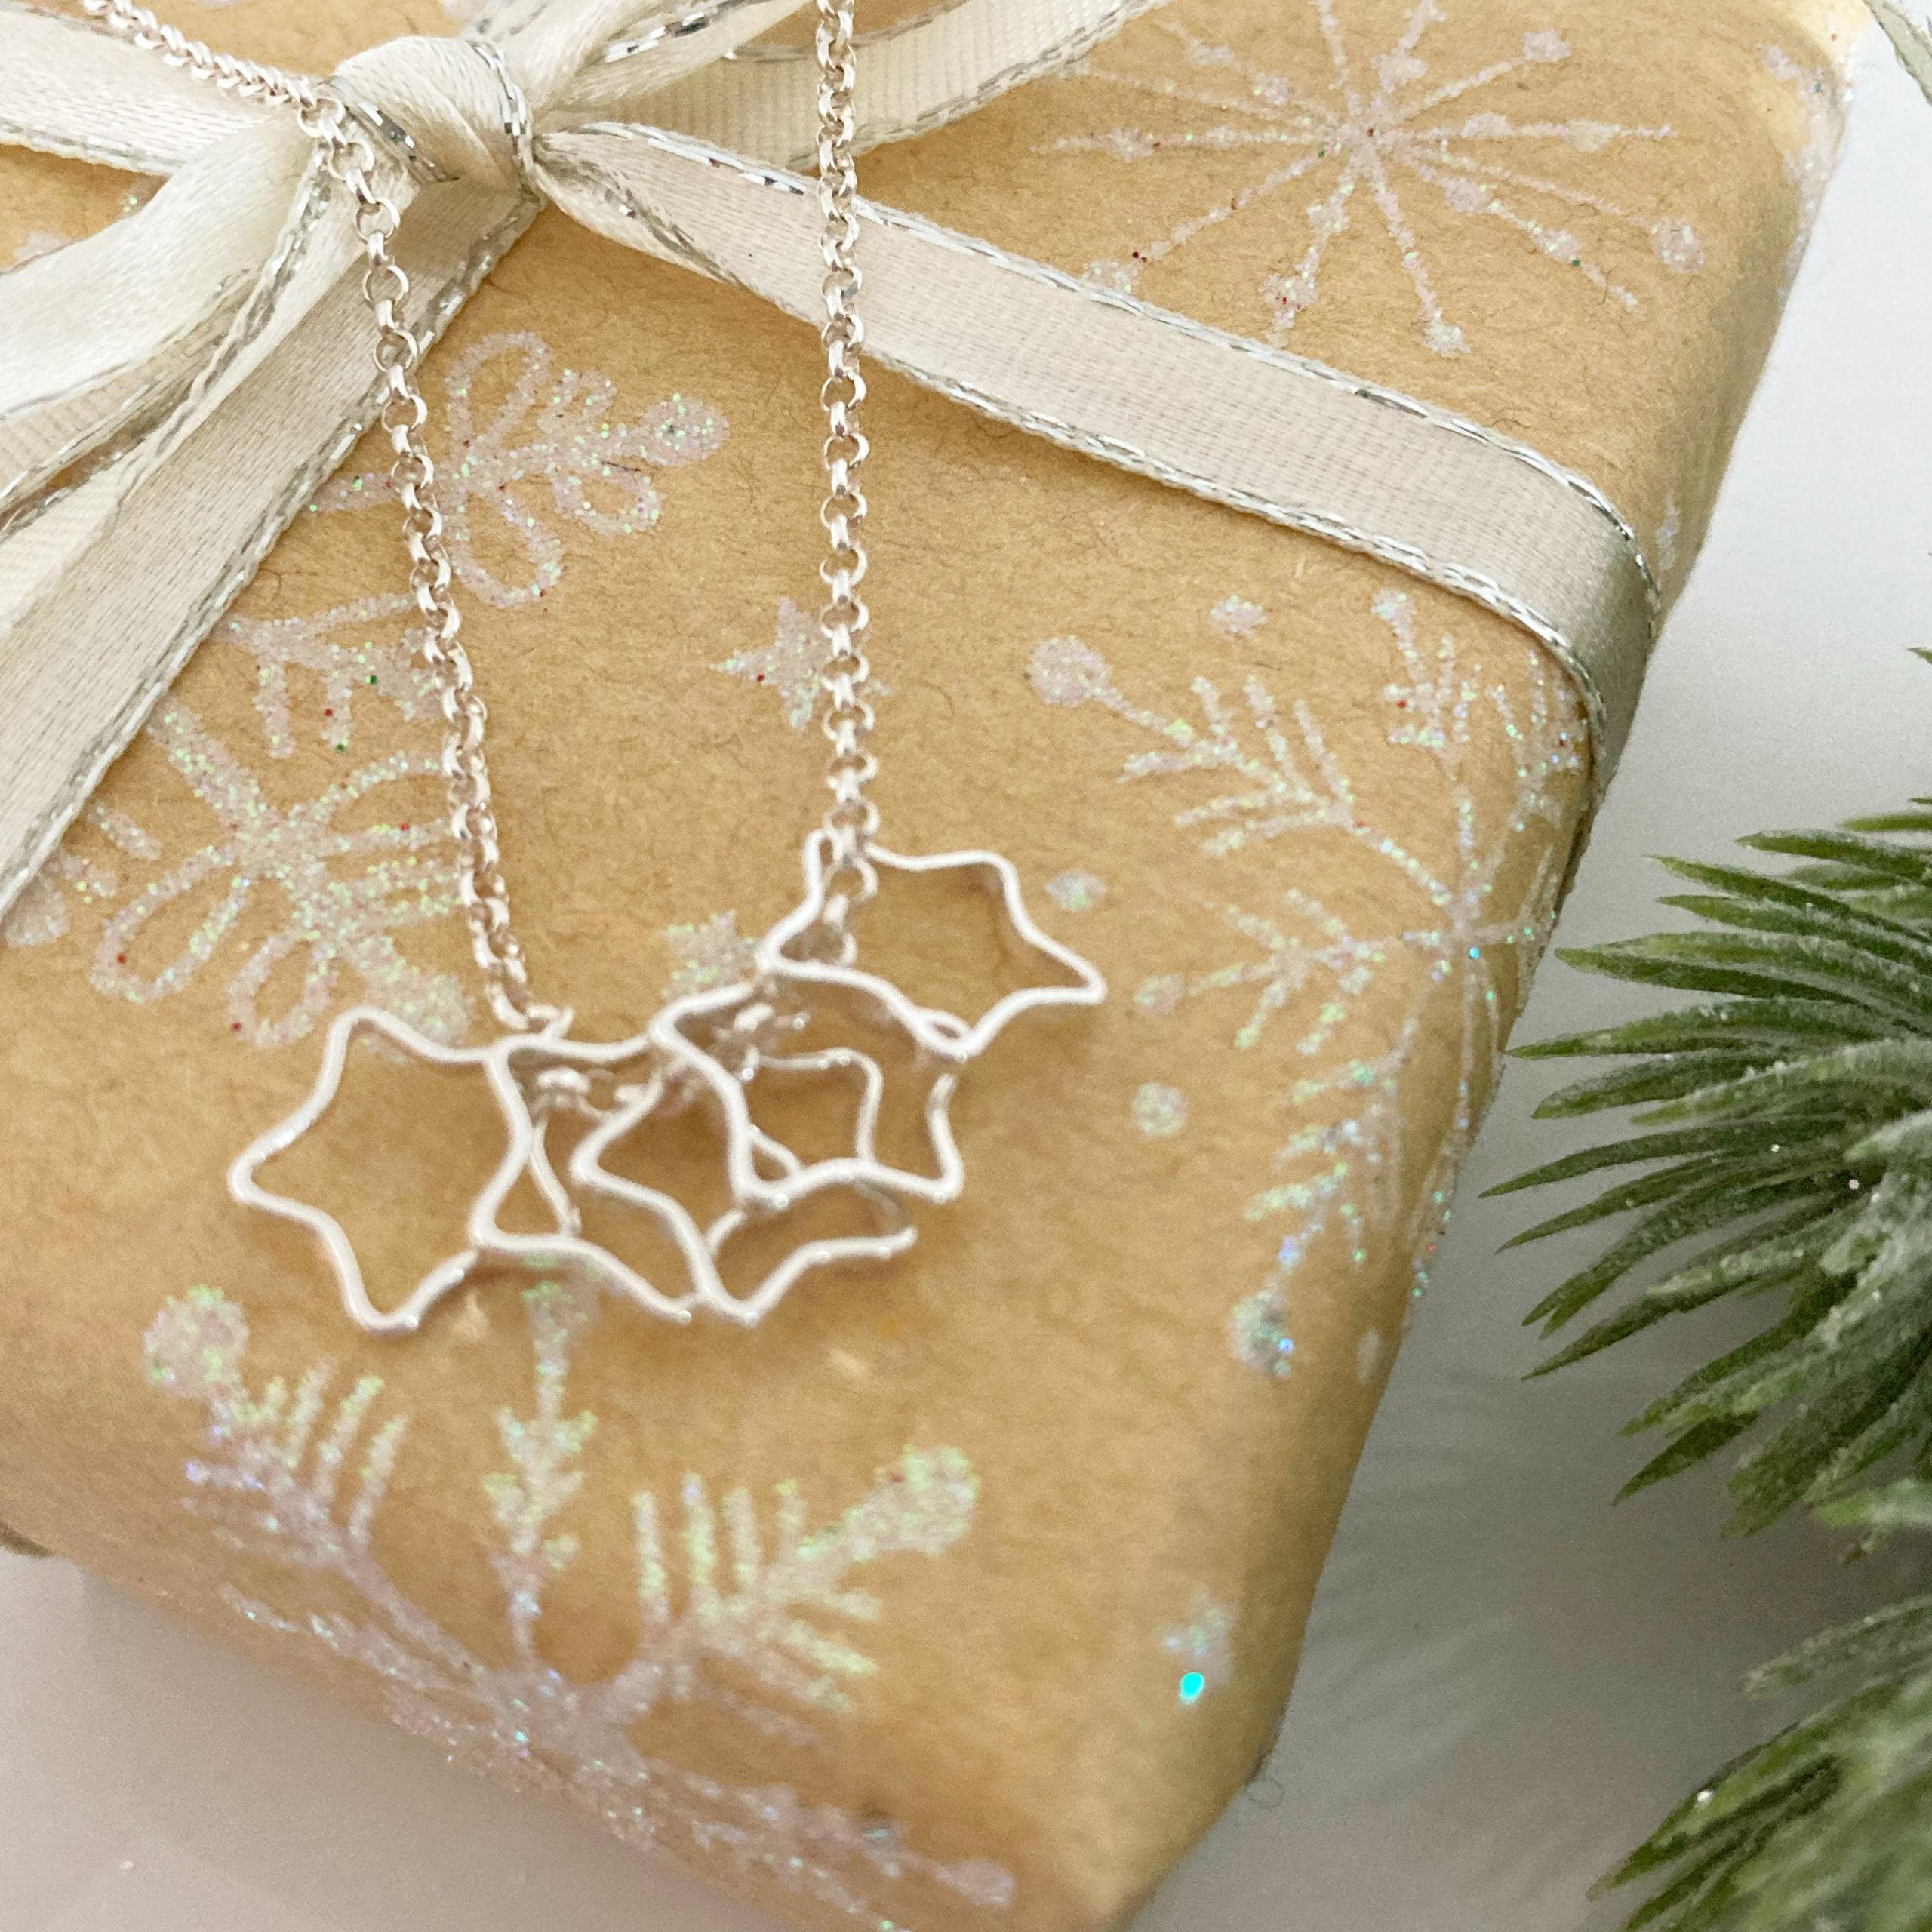 Five Star Necklace | Me Me Jewellery